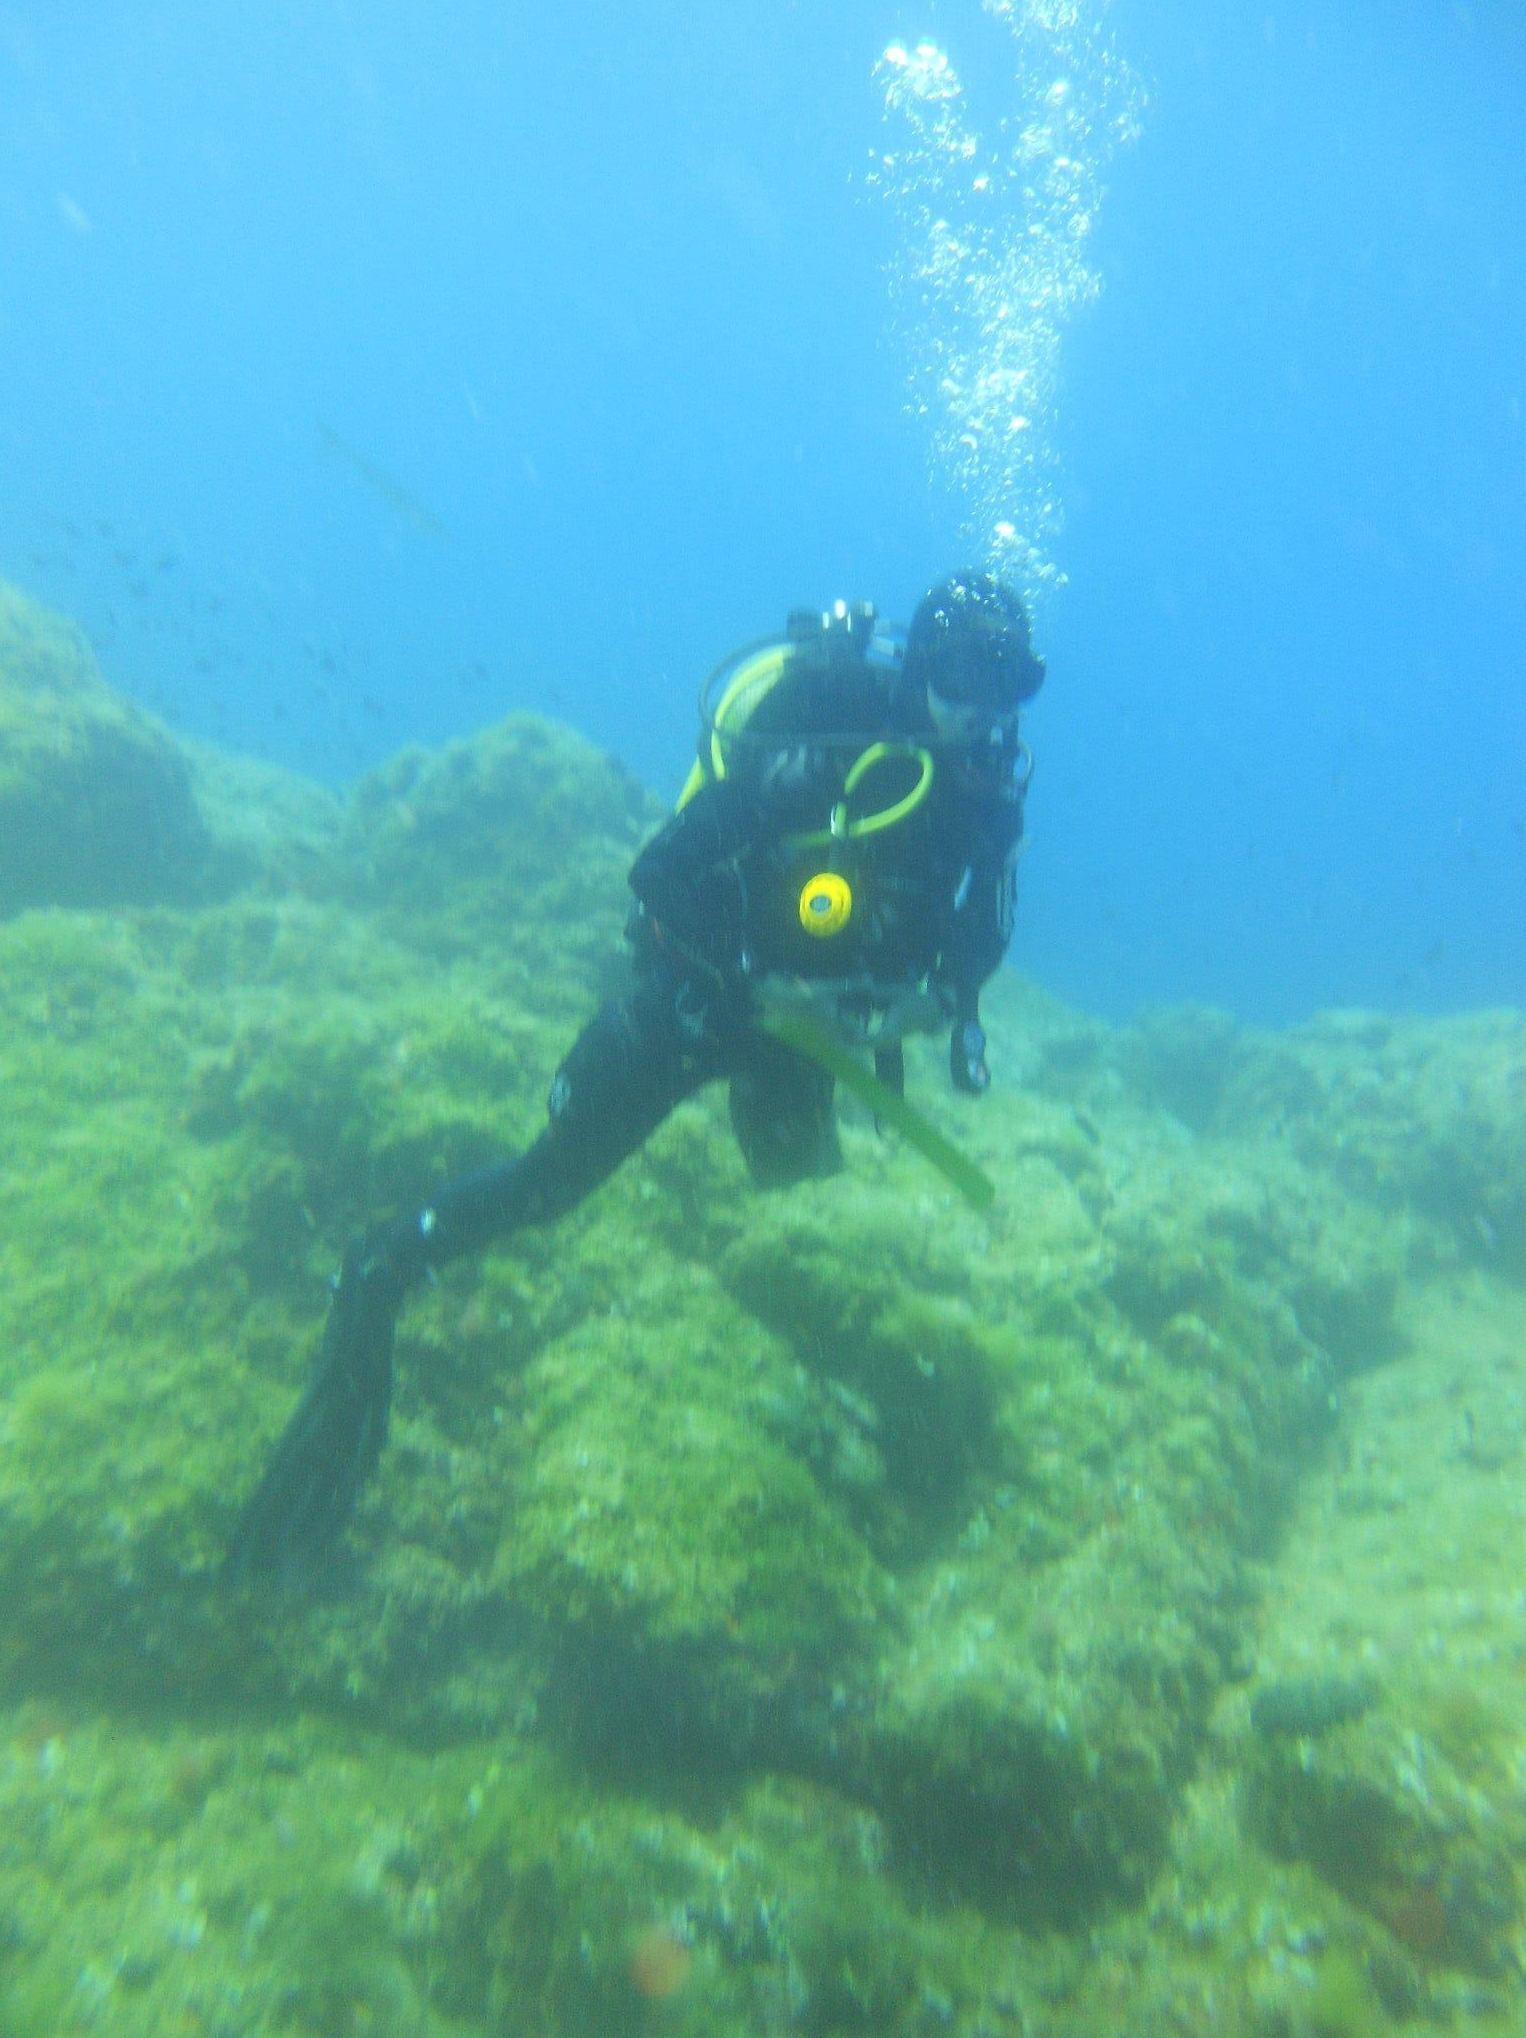 Submarinista fotografiando el fondo marino